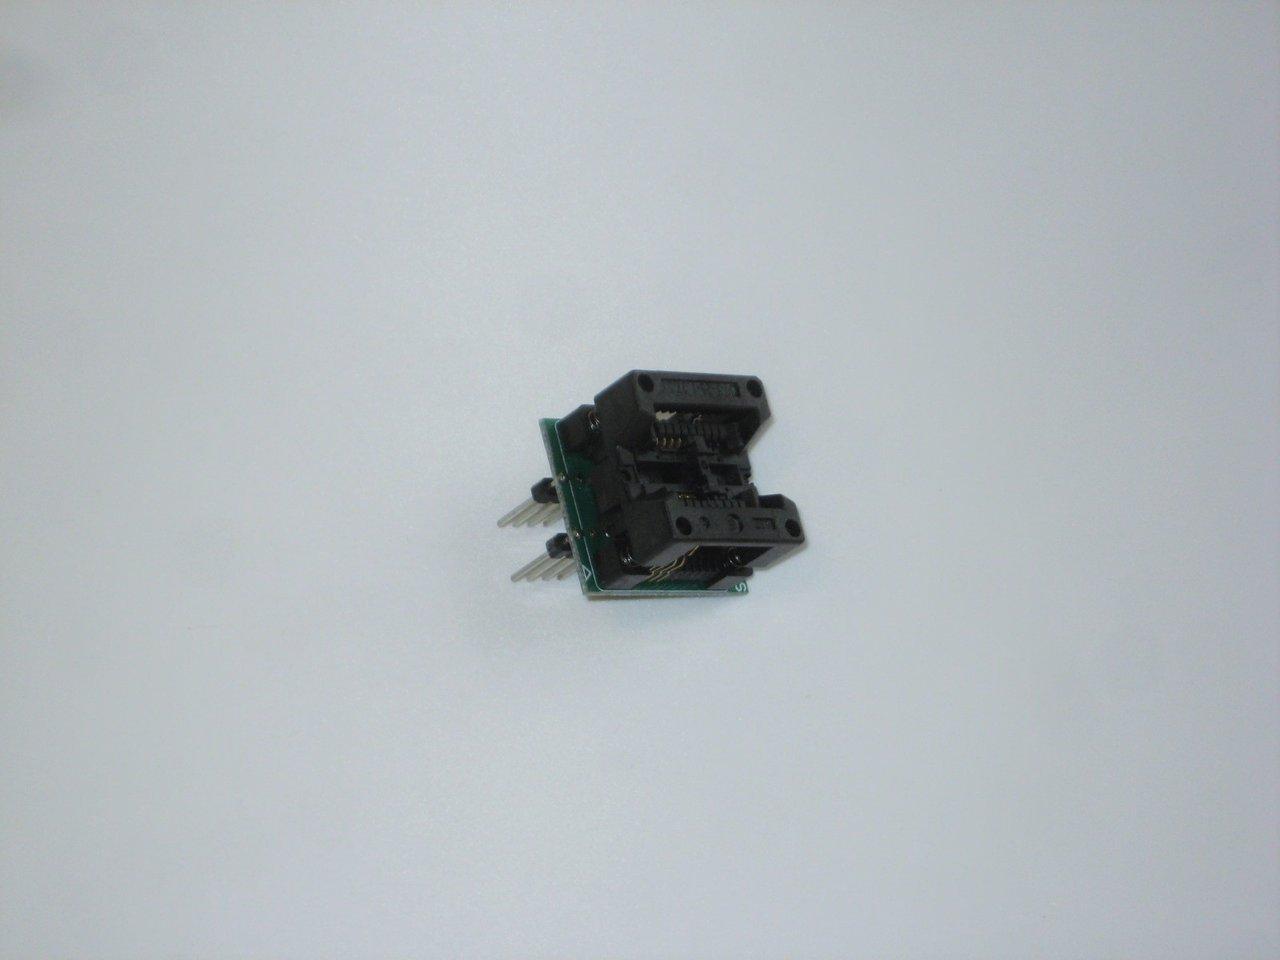 Programmeeradapter DIP voor SOIC-8 / SOP8 (209mil)